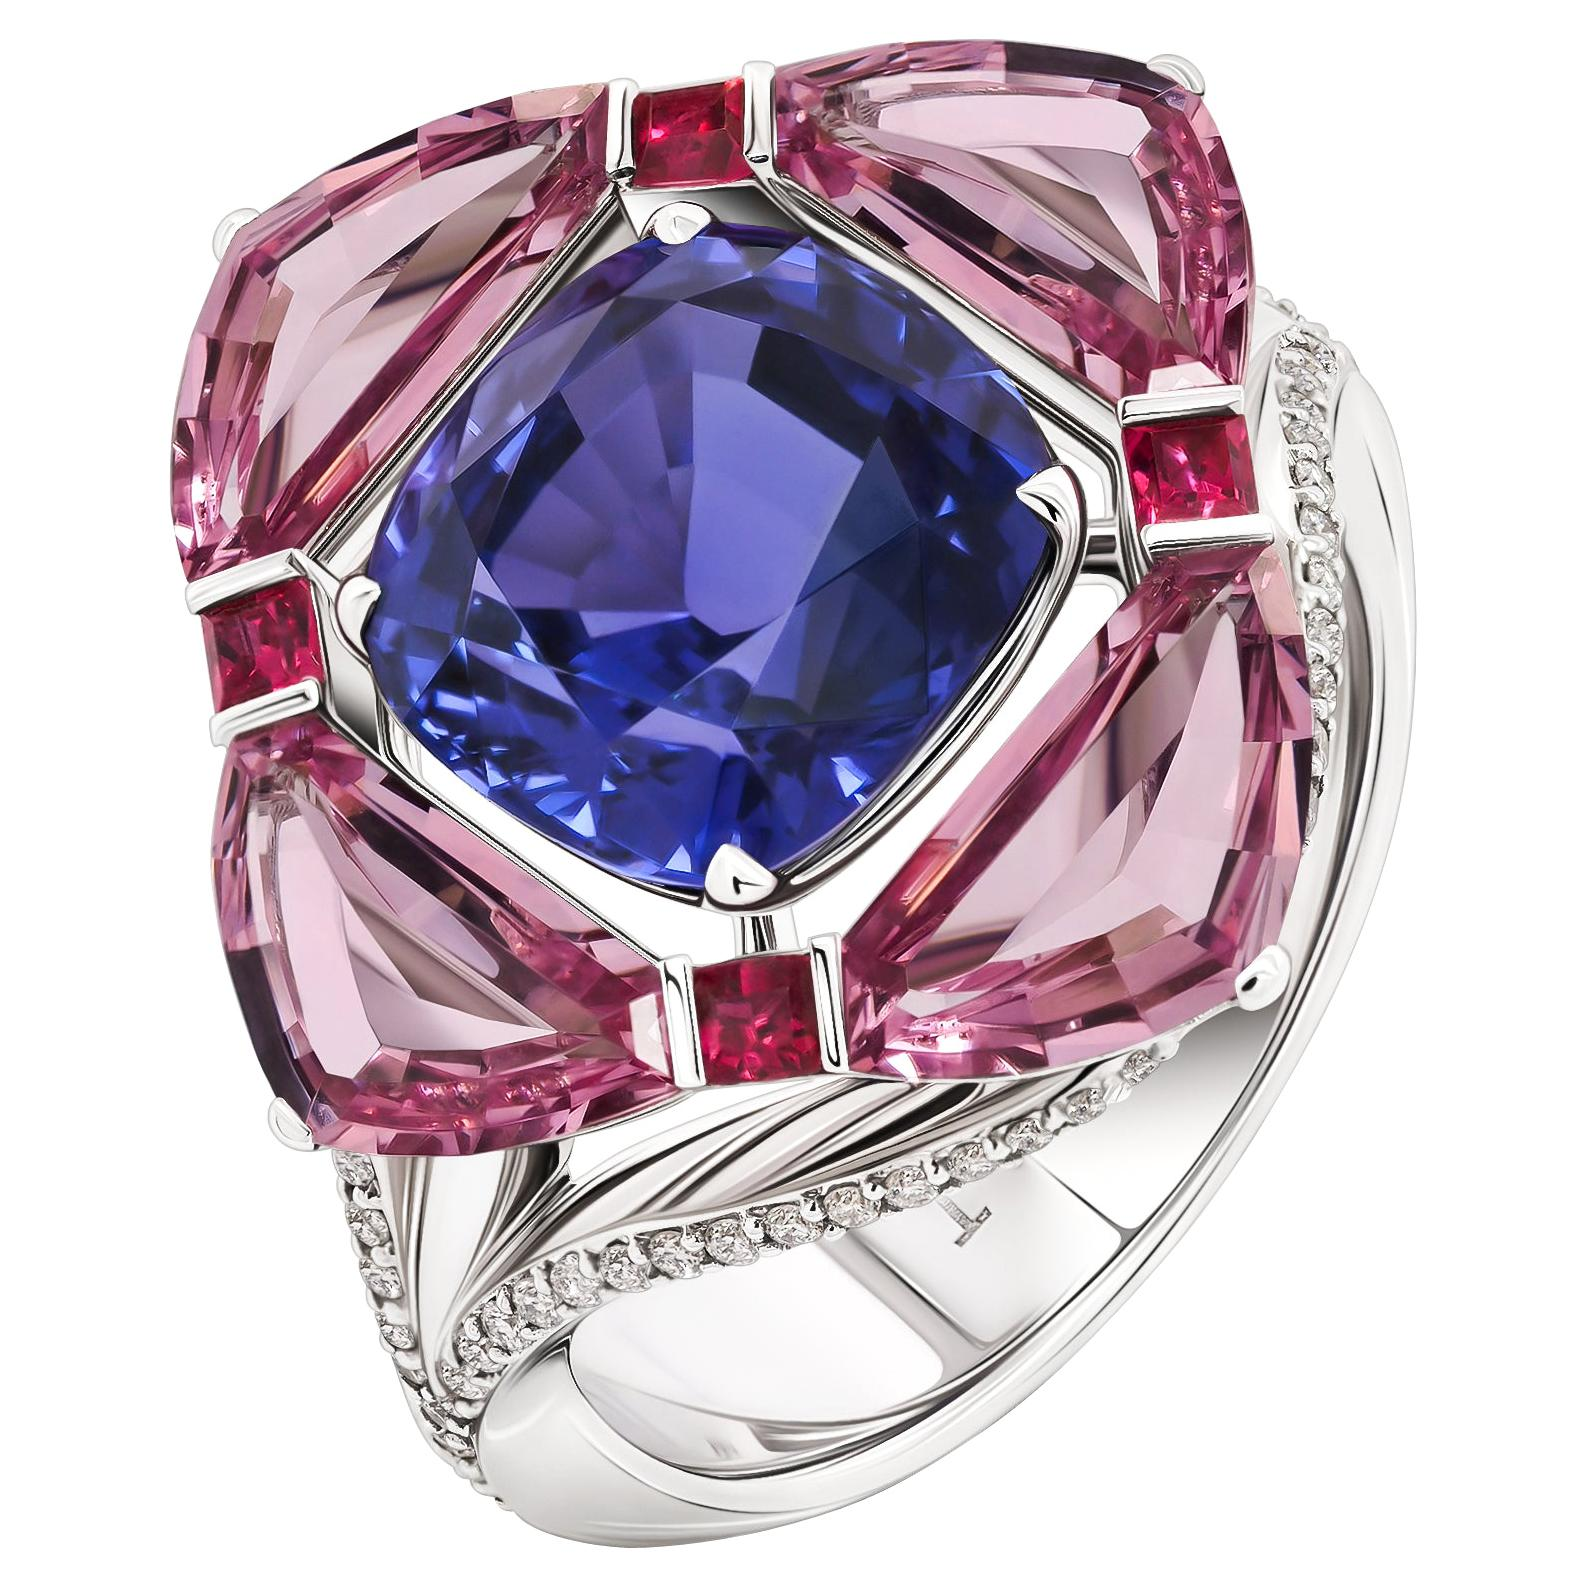 Blue Sapphire Ring, Unheated Blue Sapphire 18k White Gold & Diamonds Ring